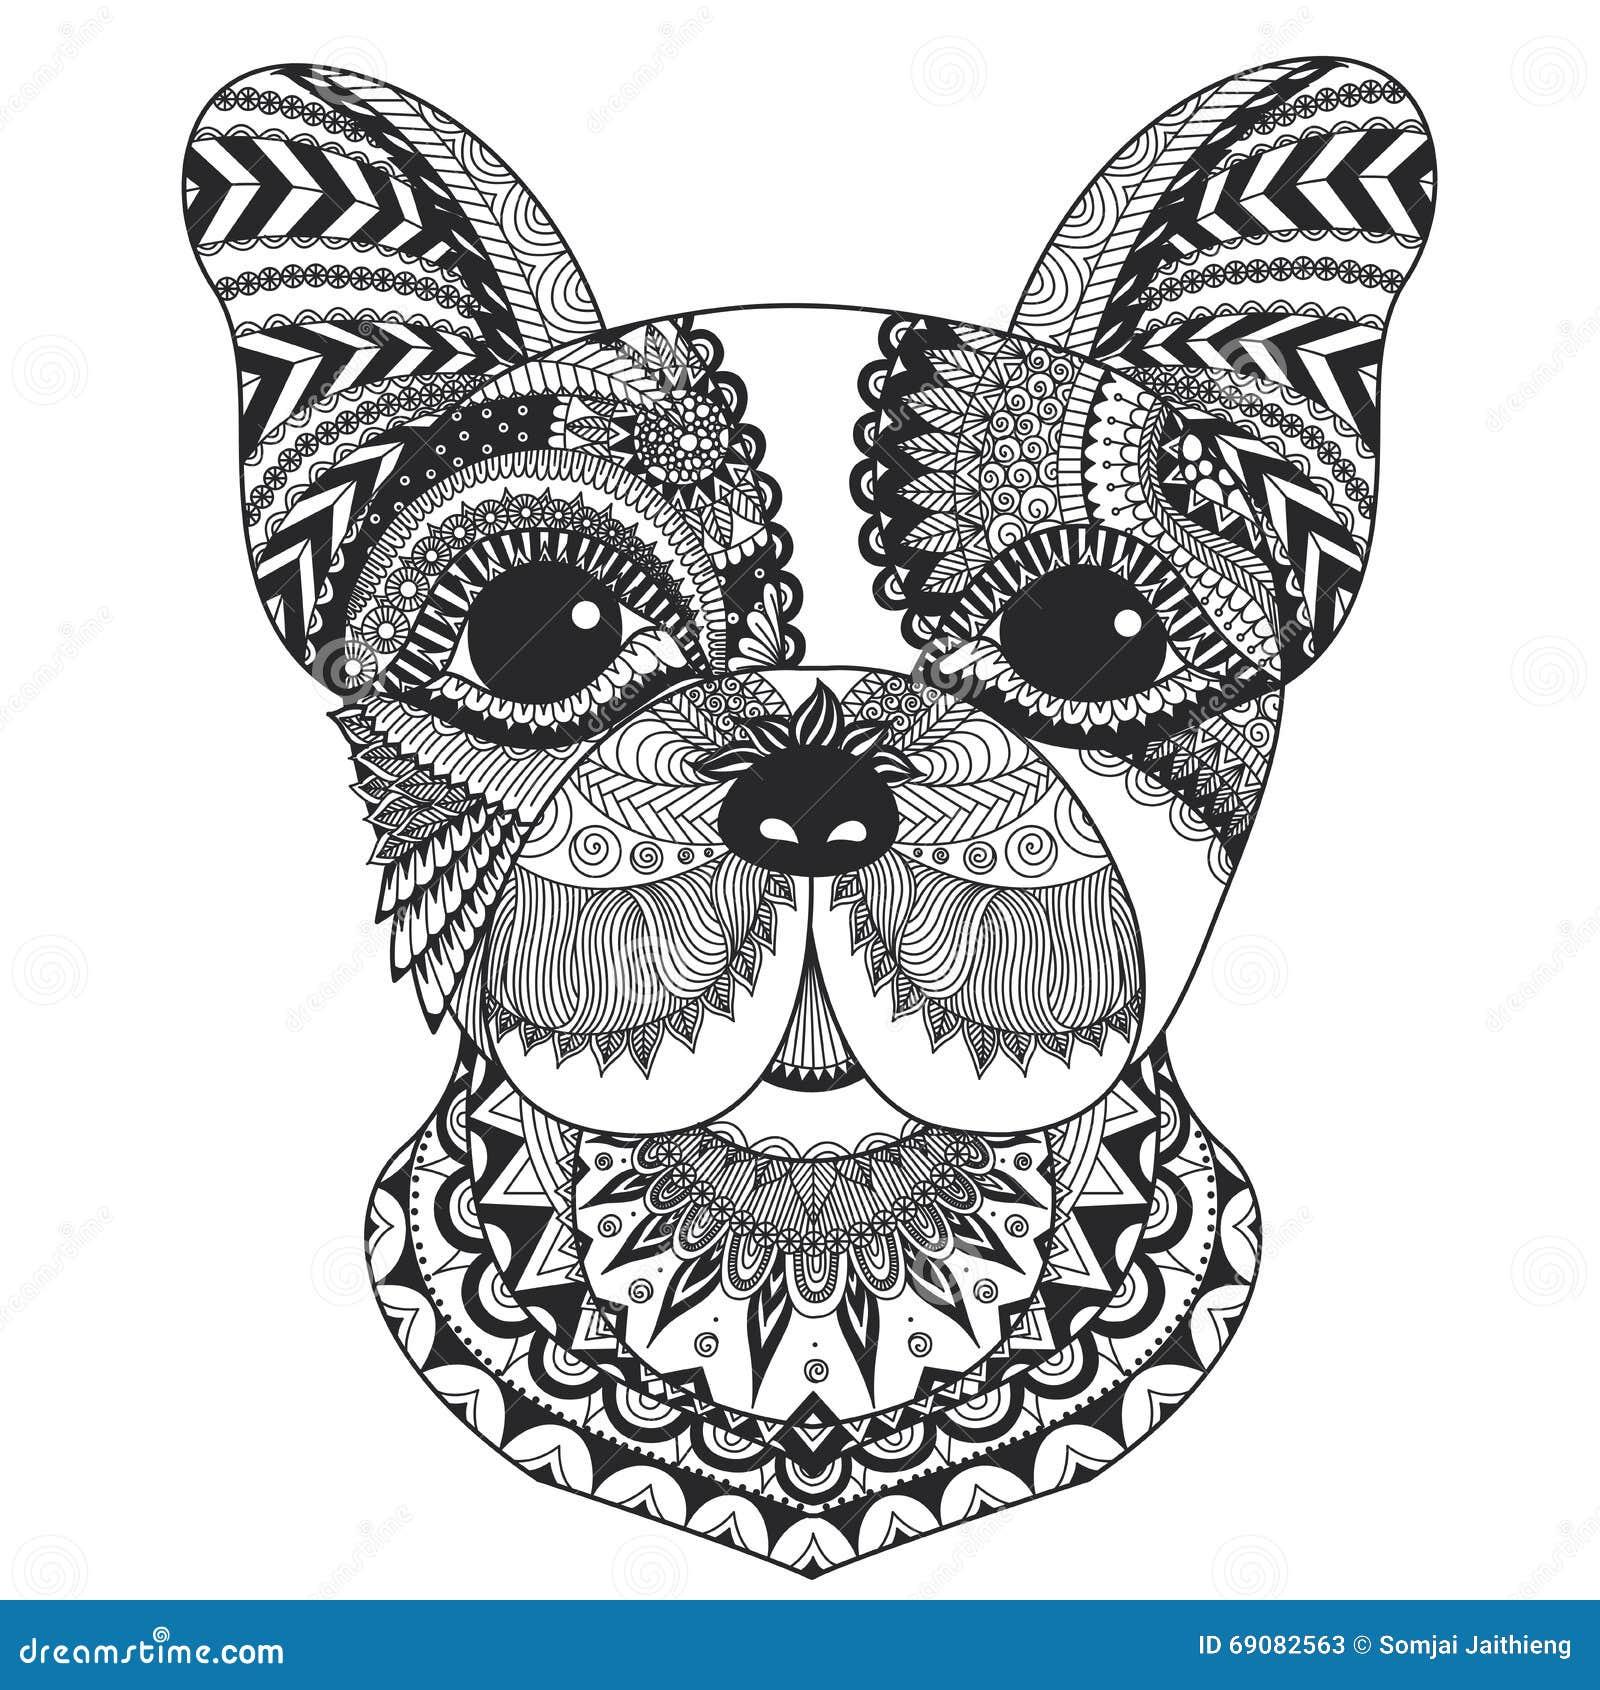 Line Art T Shirt Design : French bulldog line art design for coloring book adult